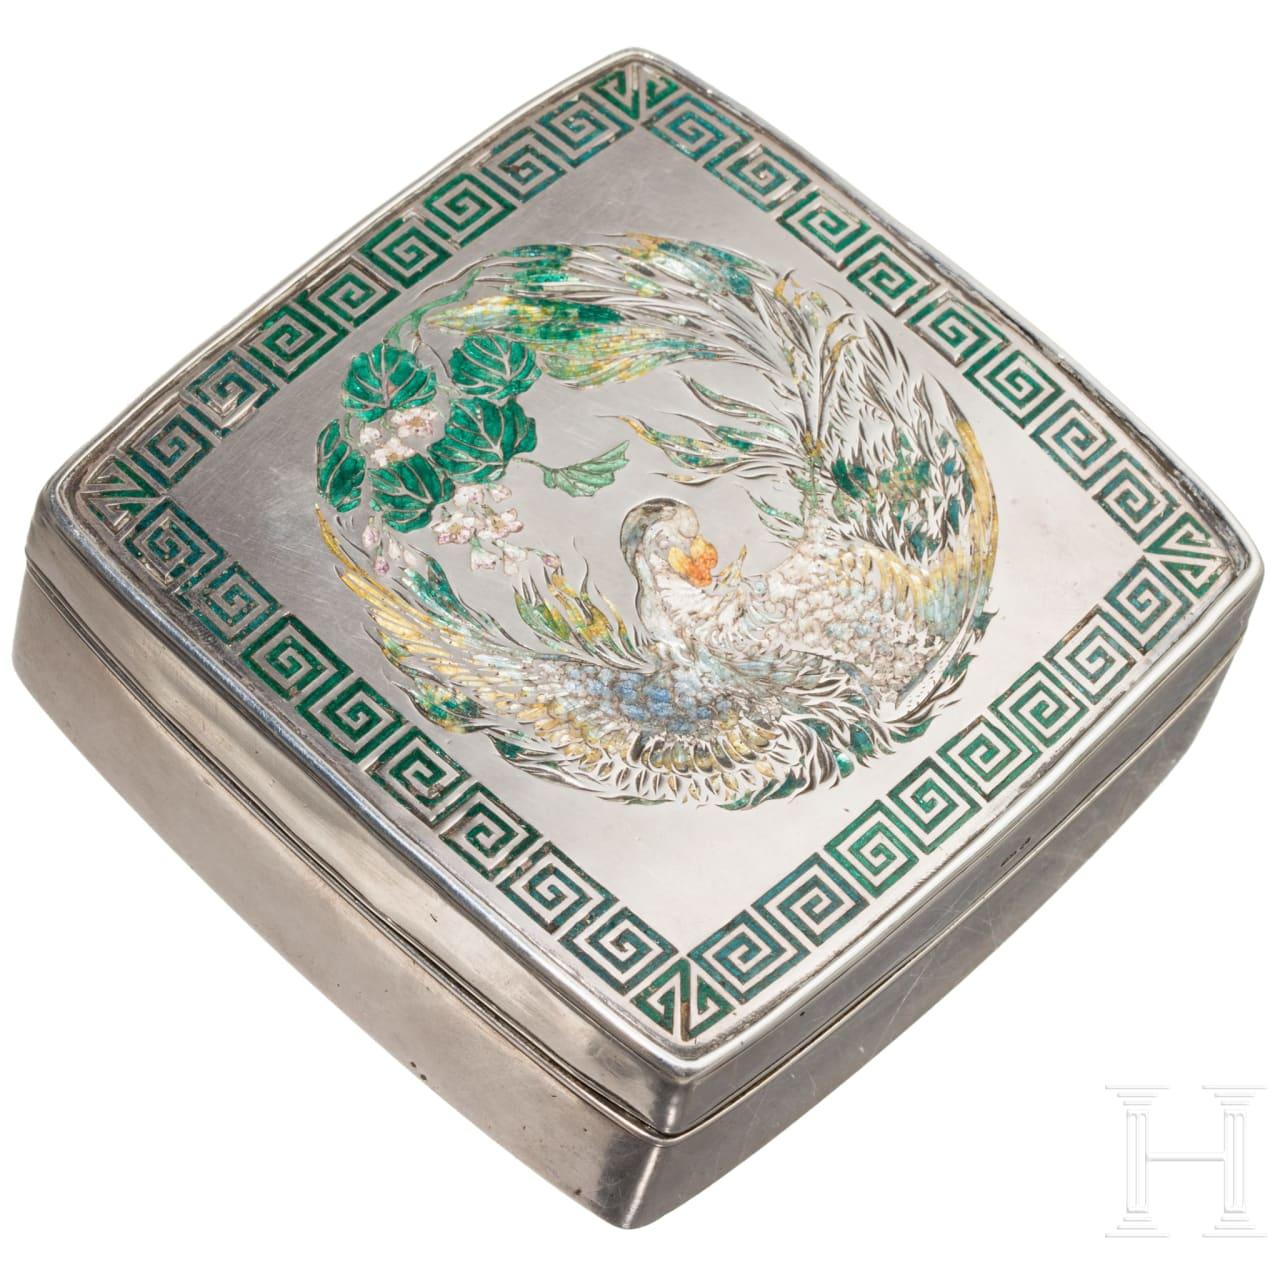 Prof. Francis Elgar – a silver presentation box by the Japanese Emperor, circa 1880